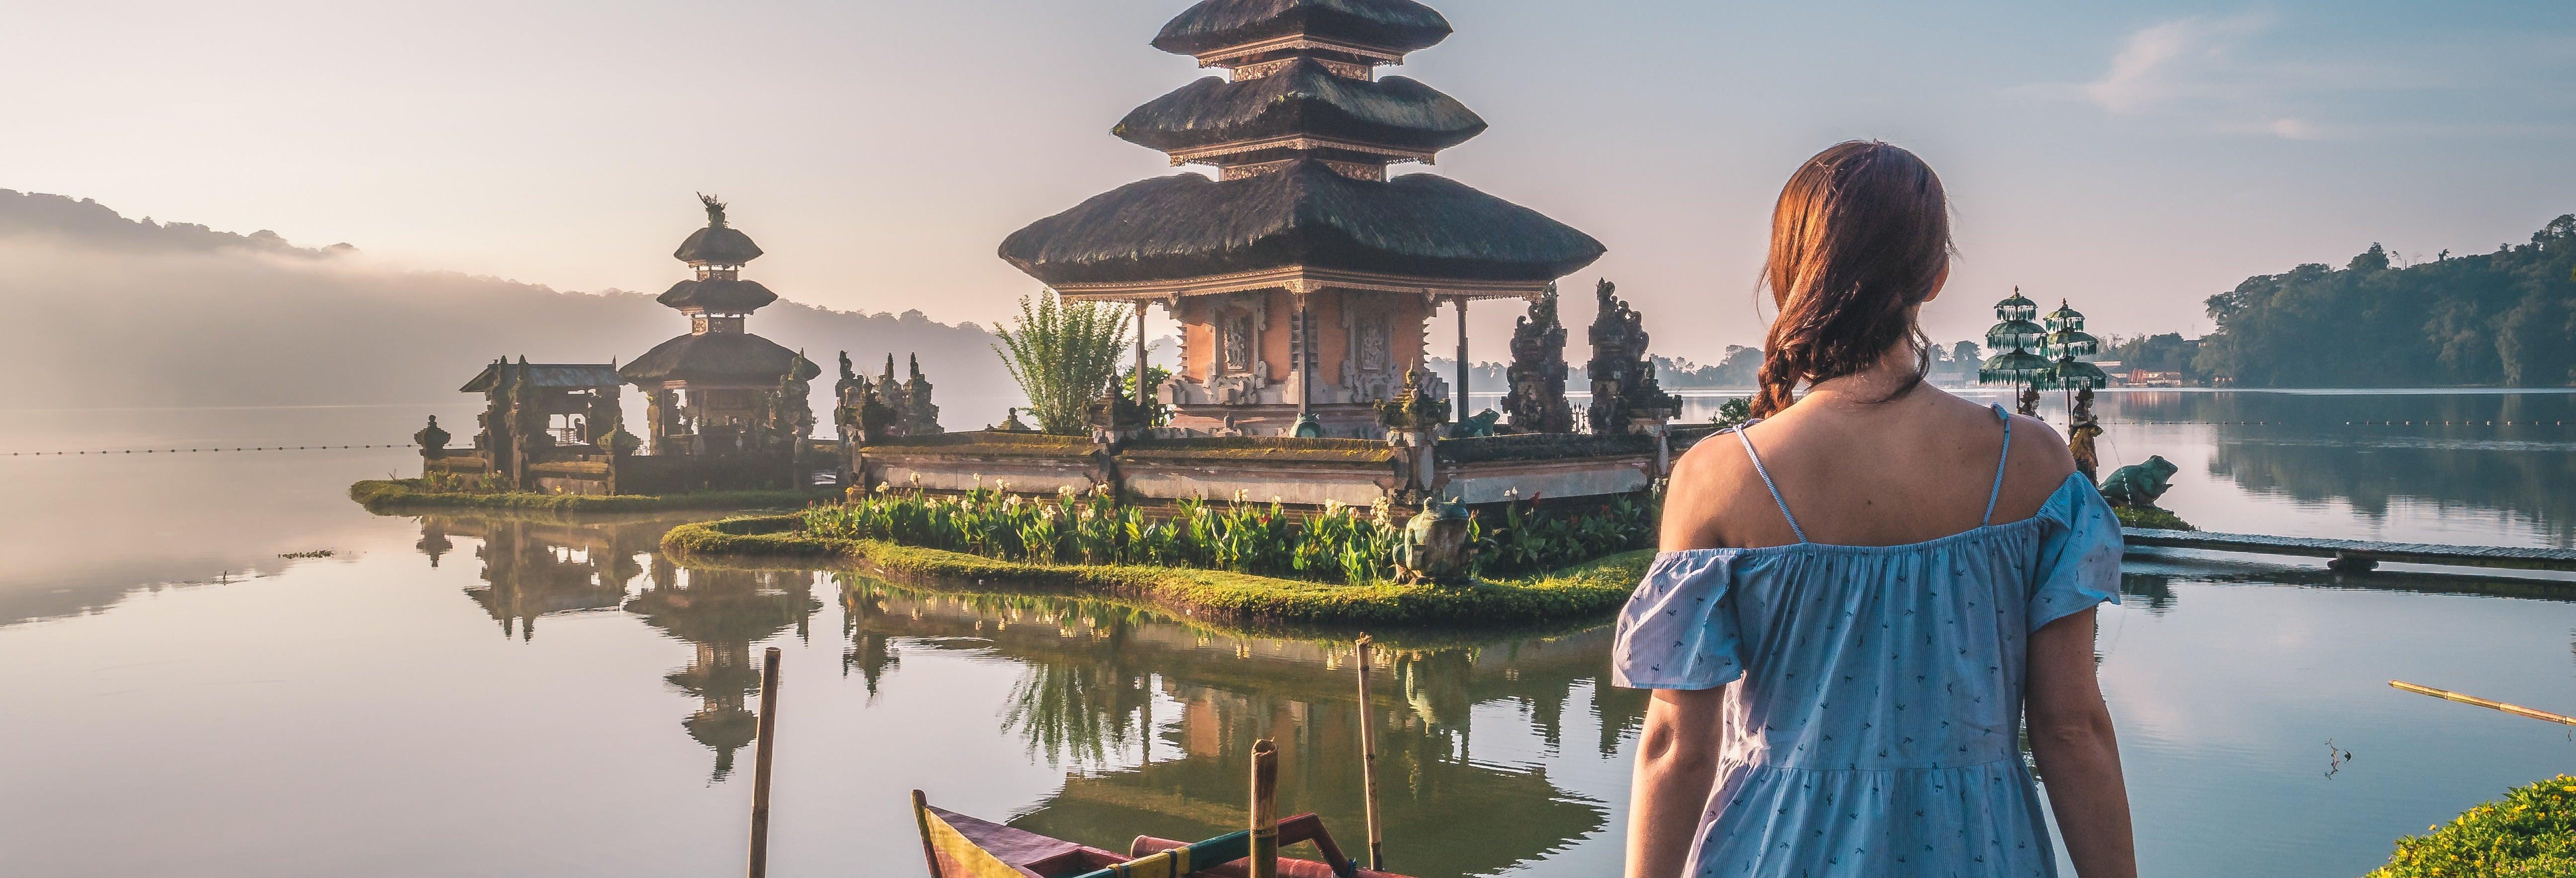 Transfert jusqu'à Bali en bateau rapide